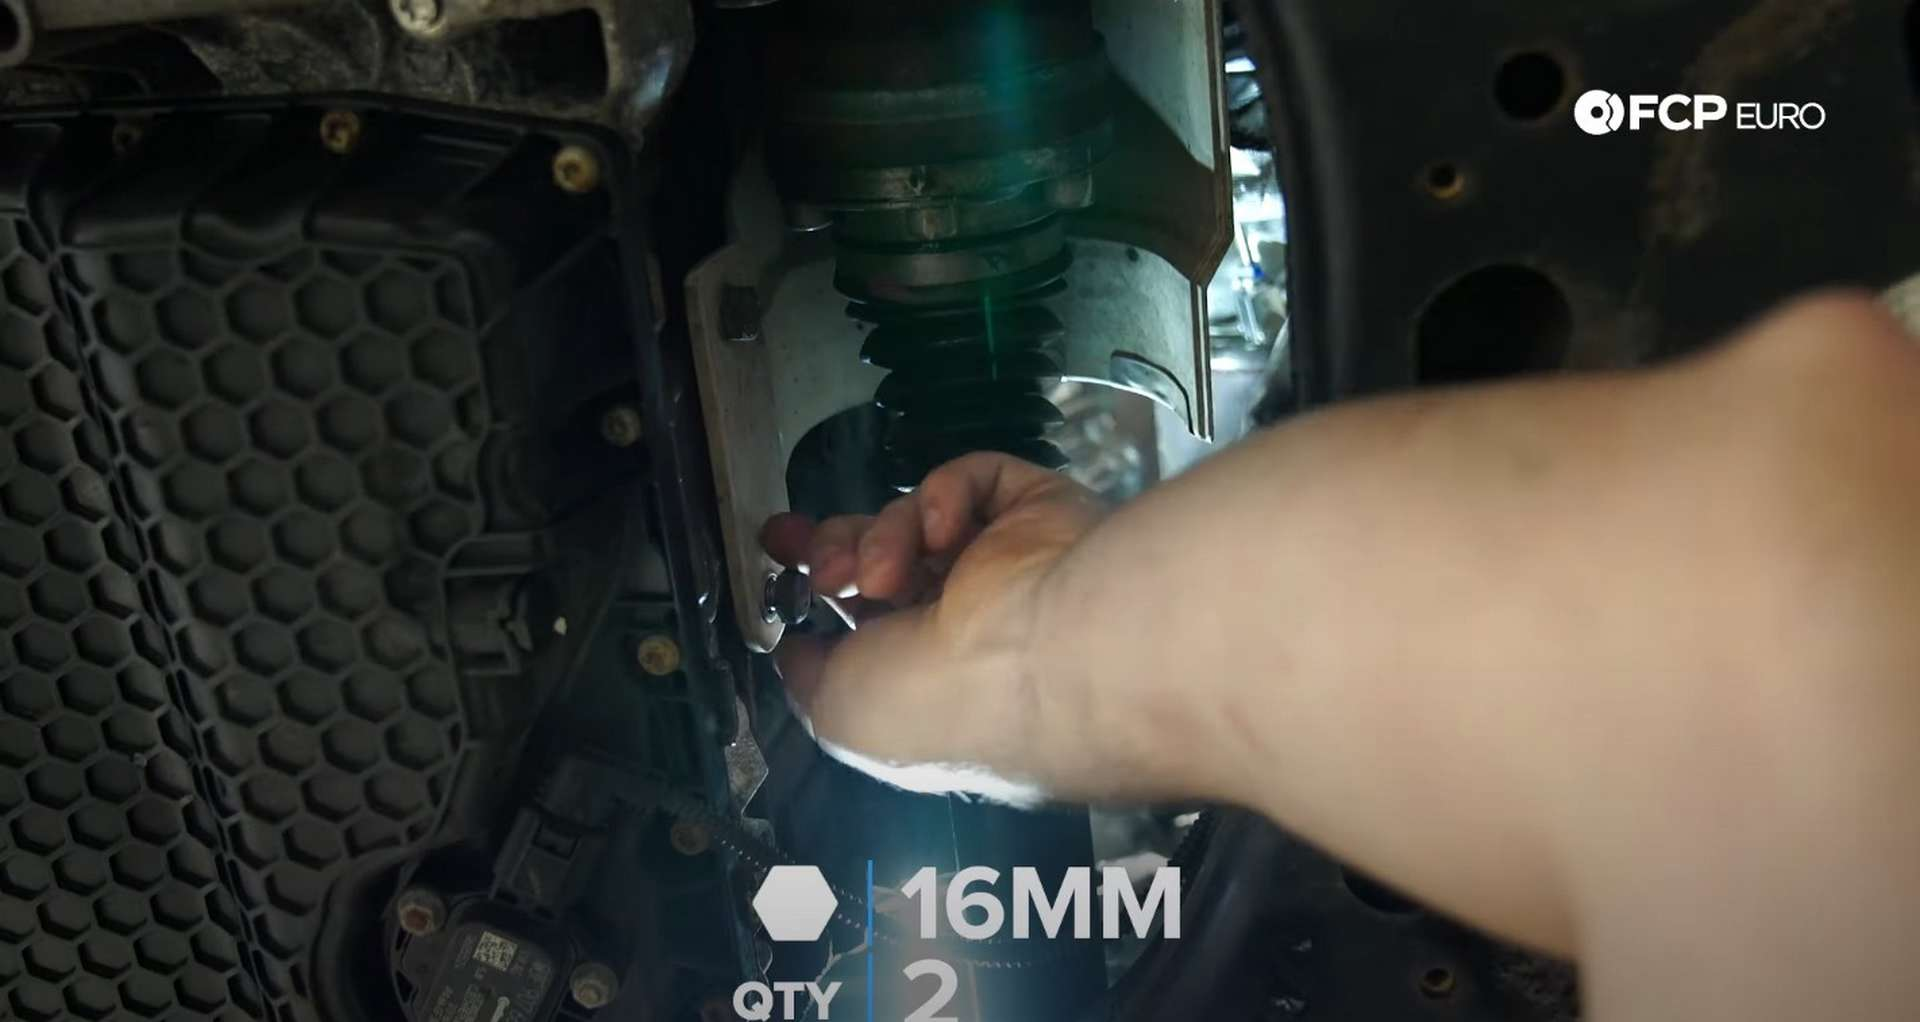 DIY MK7 VW GTI Turbocharger Upgrade installing the axle's heat shield